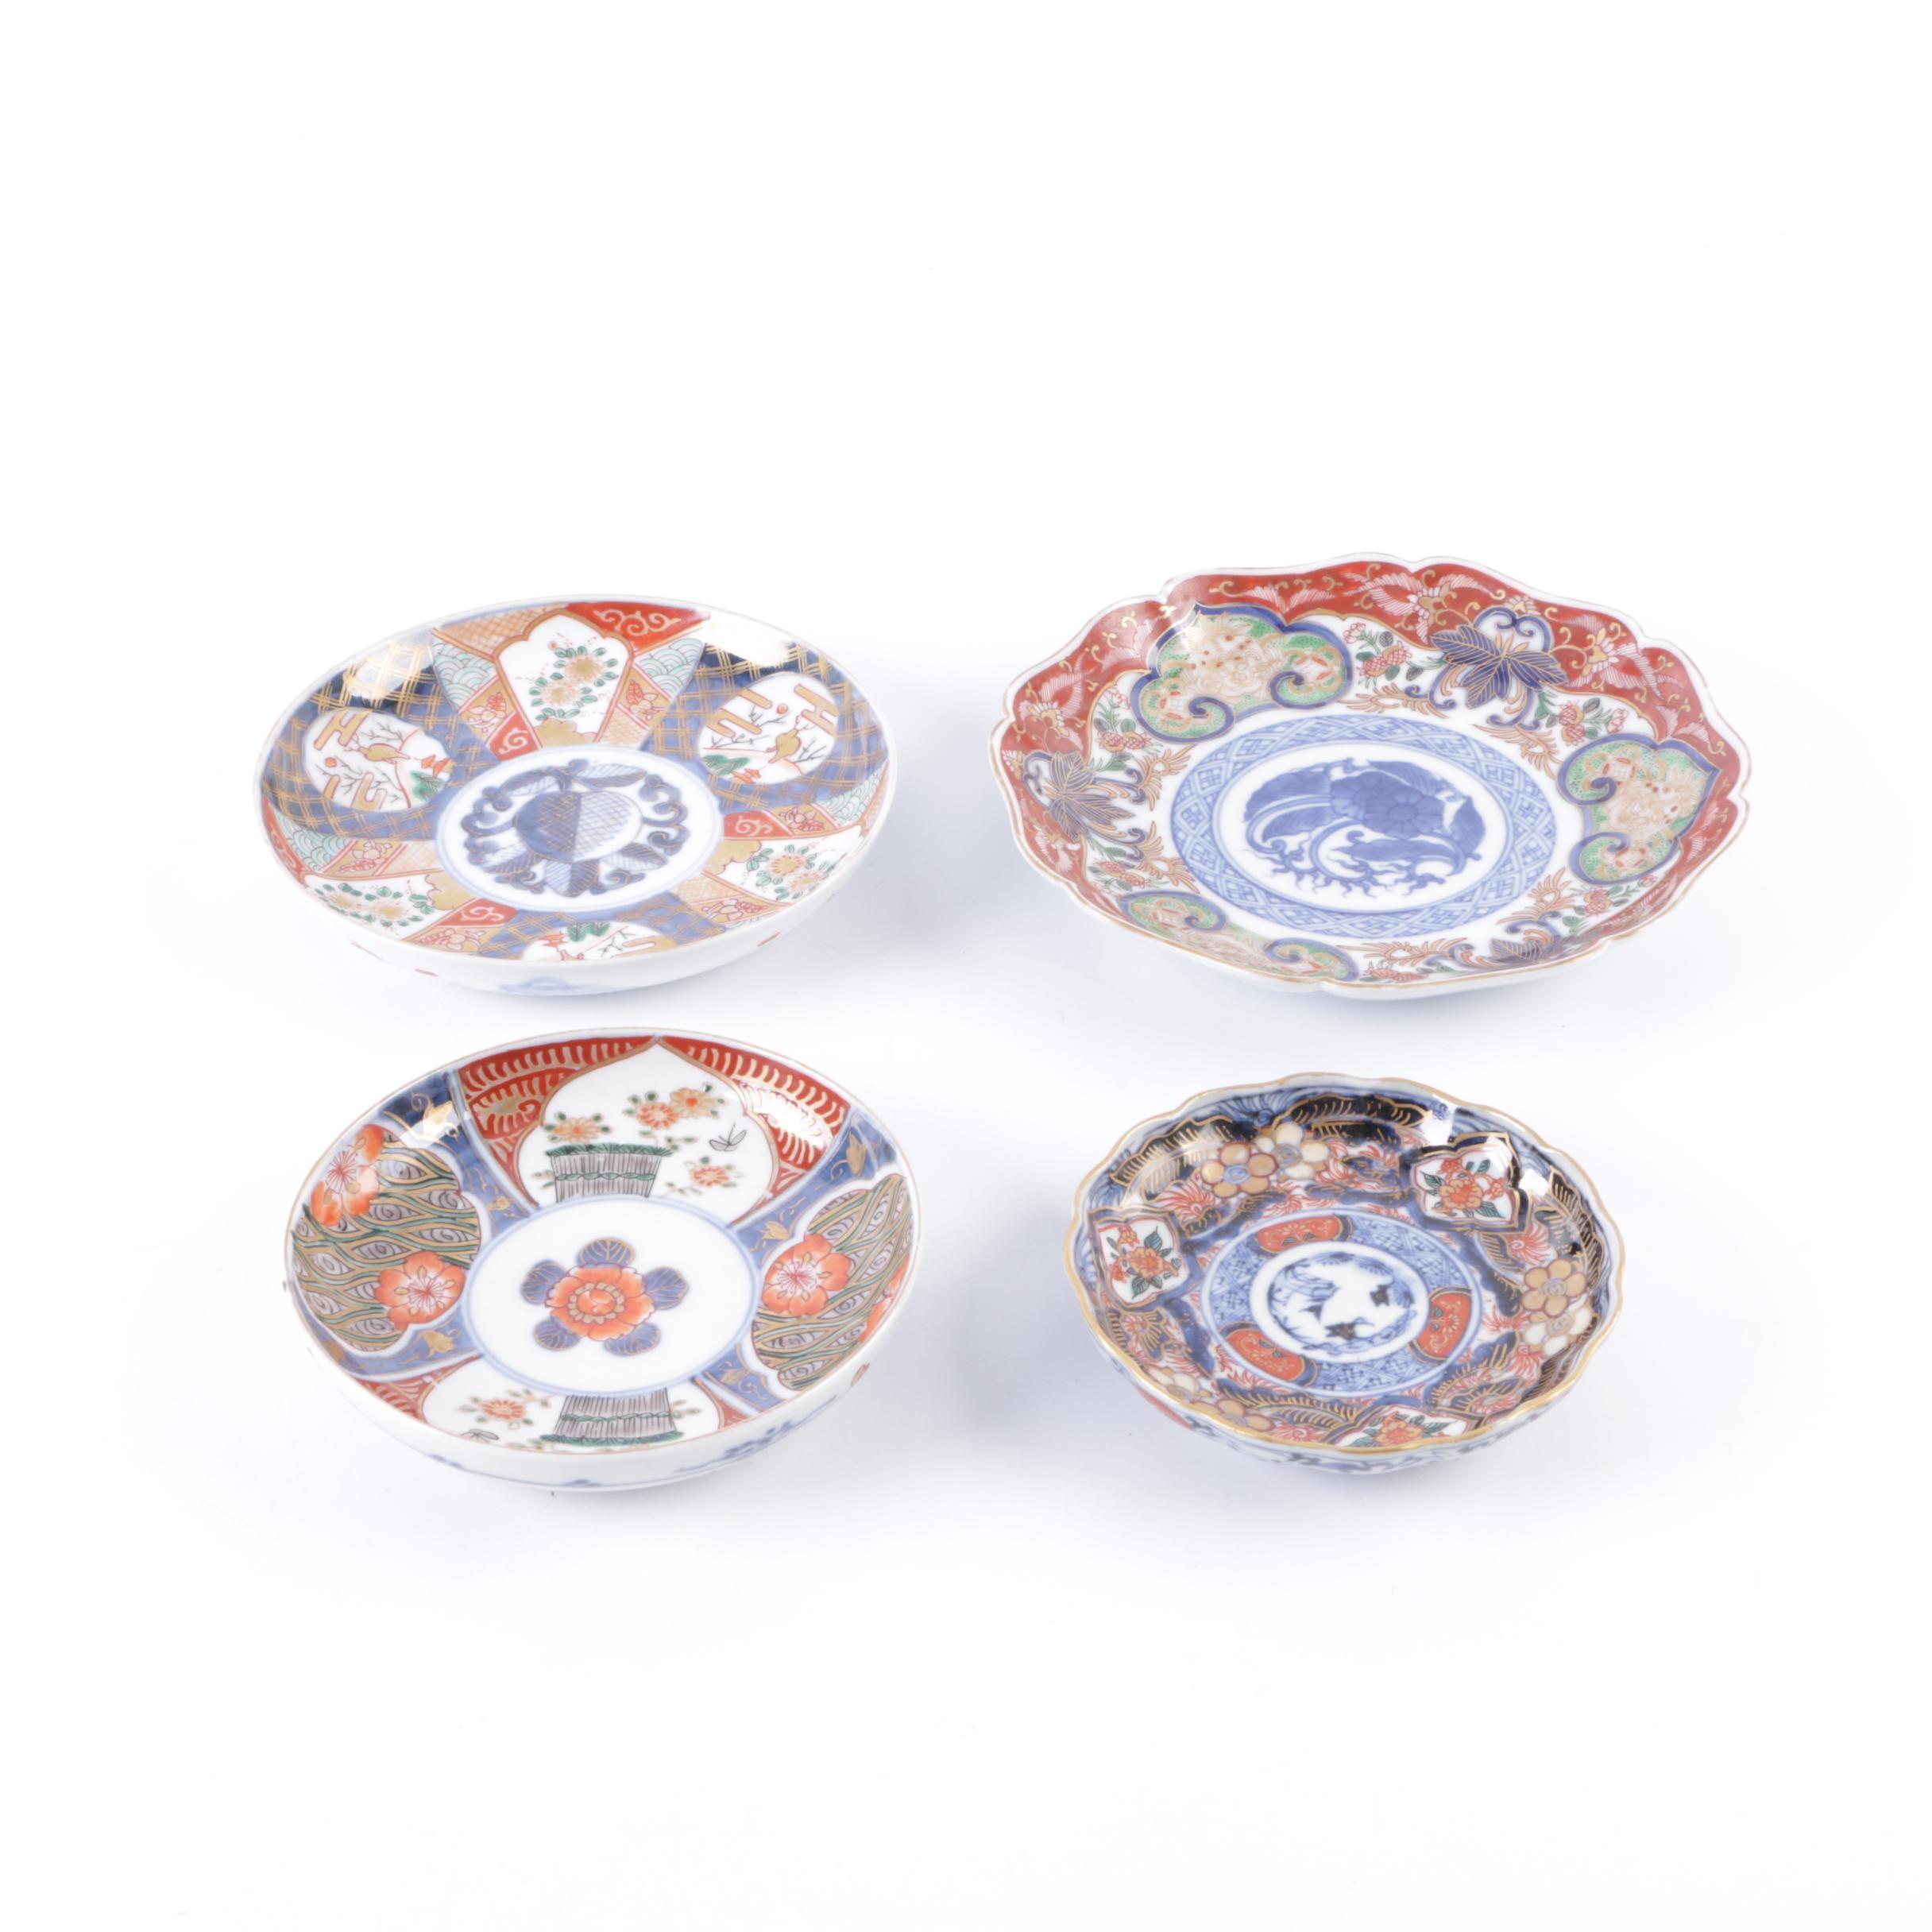 Collection of Imari Ware Plates